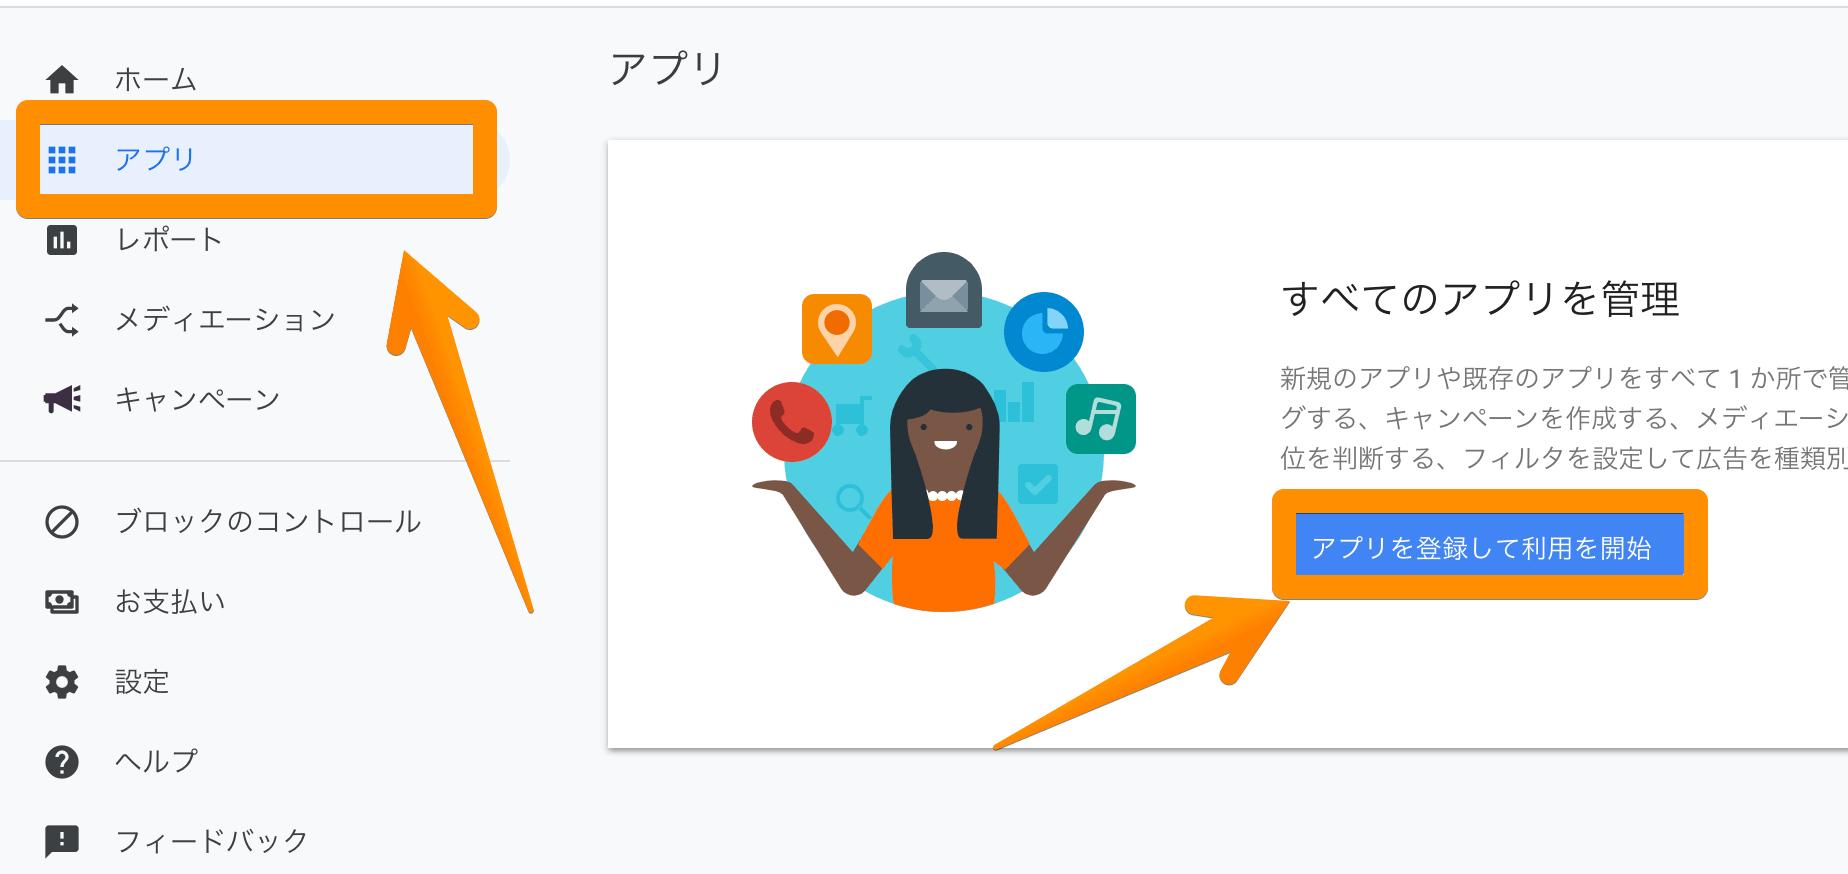 AdMobでアプリを登録する